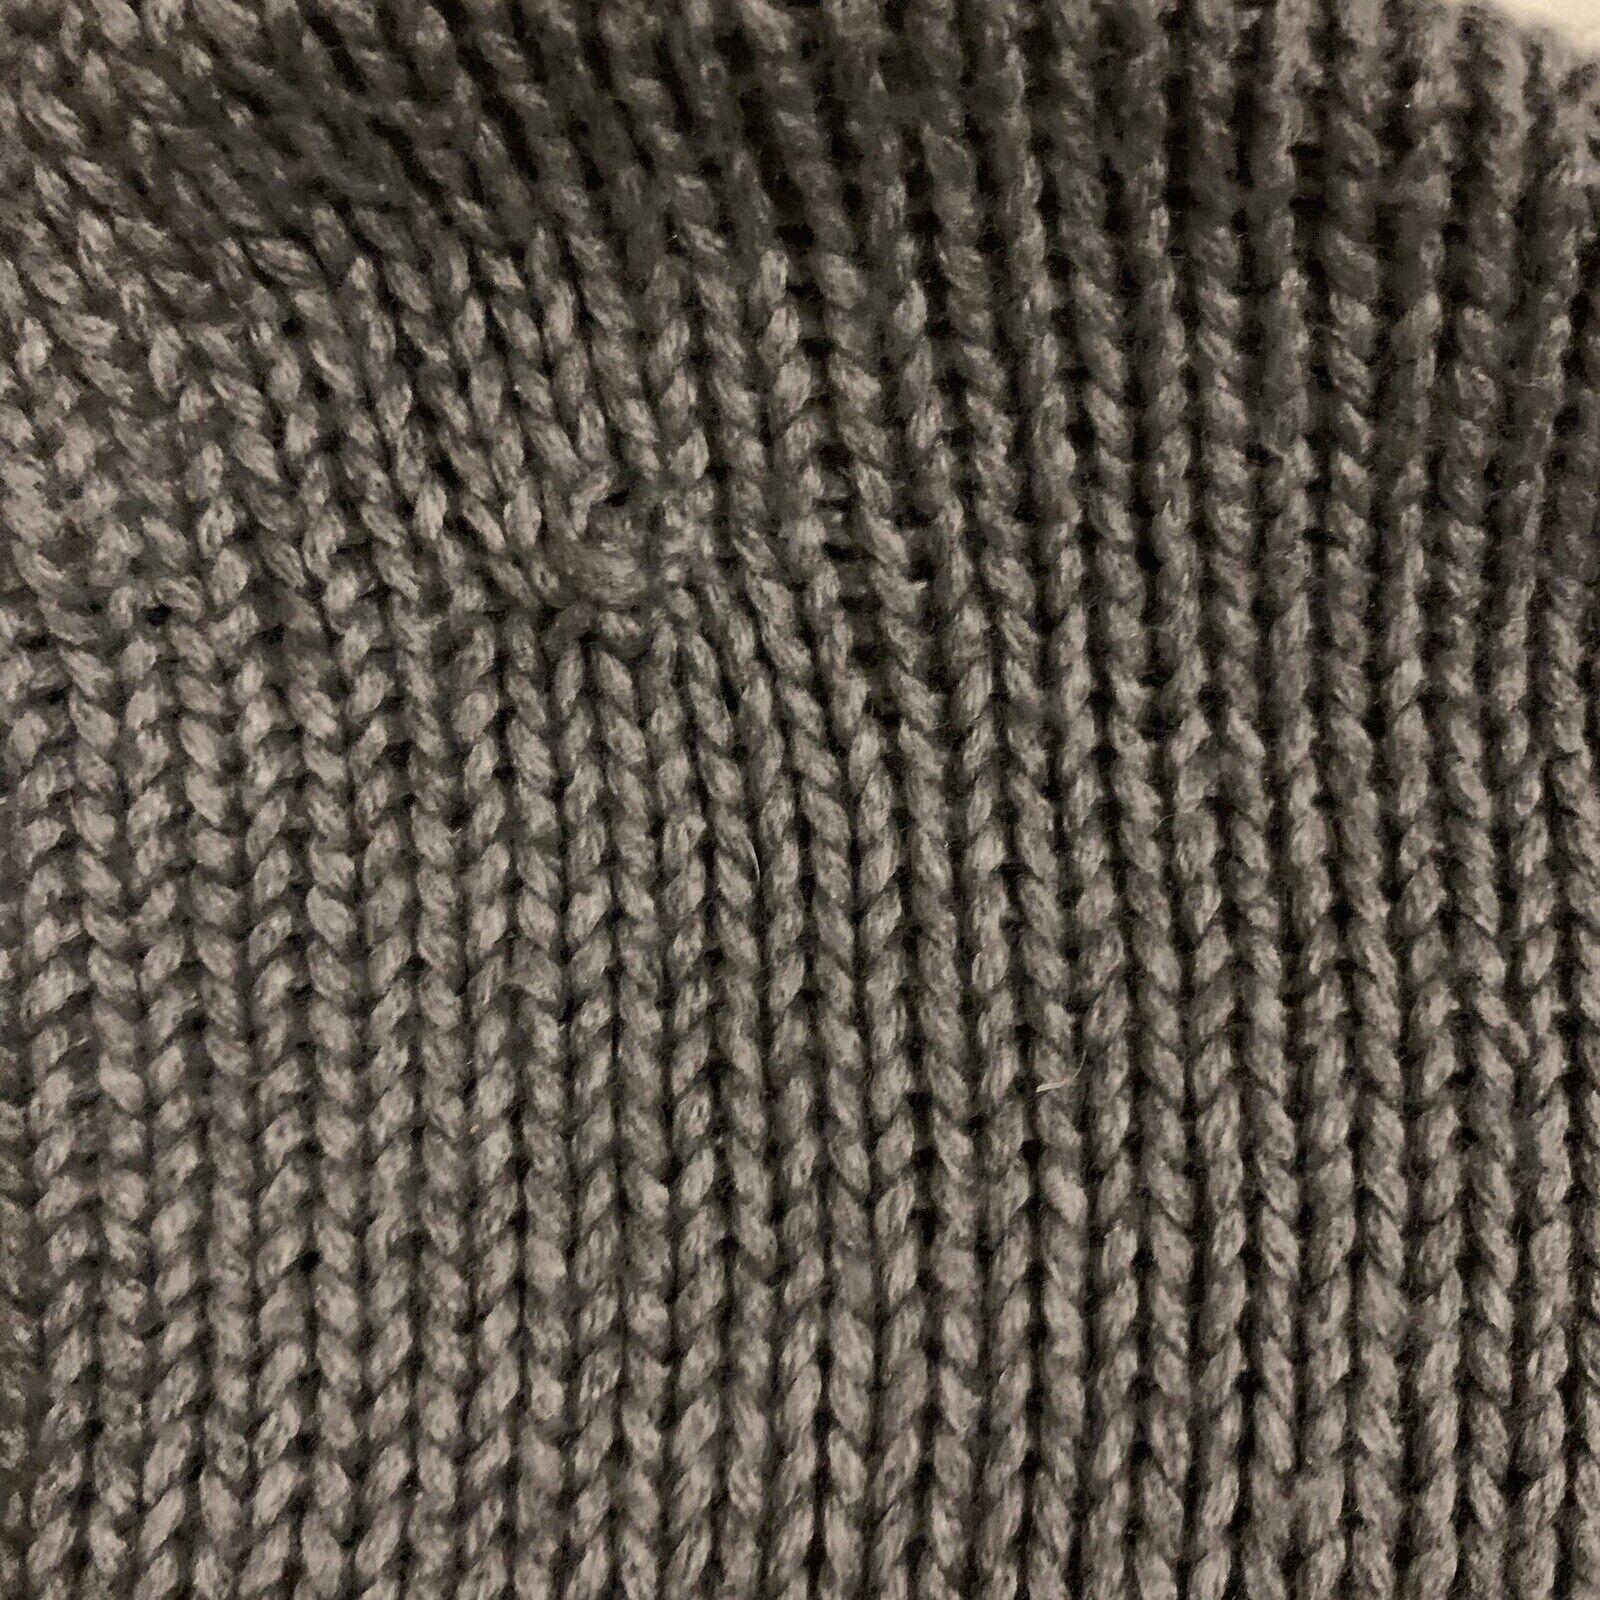 Victoria's Secret varsity letter gray sweater S - image 6